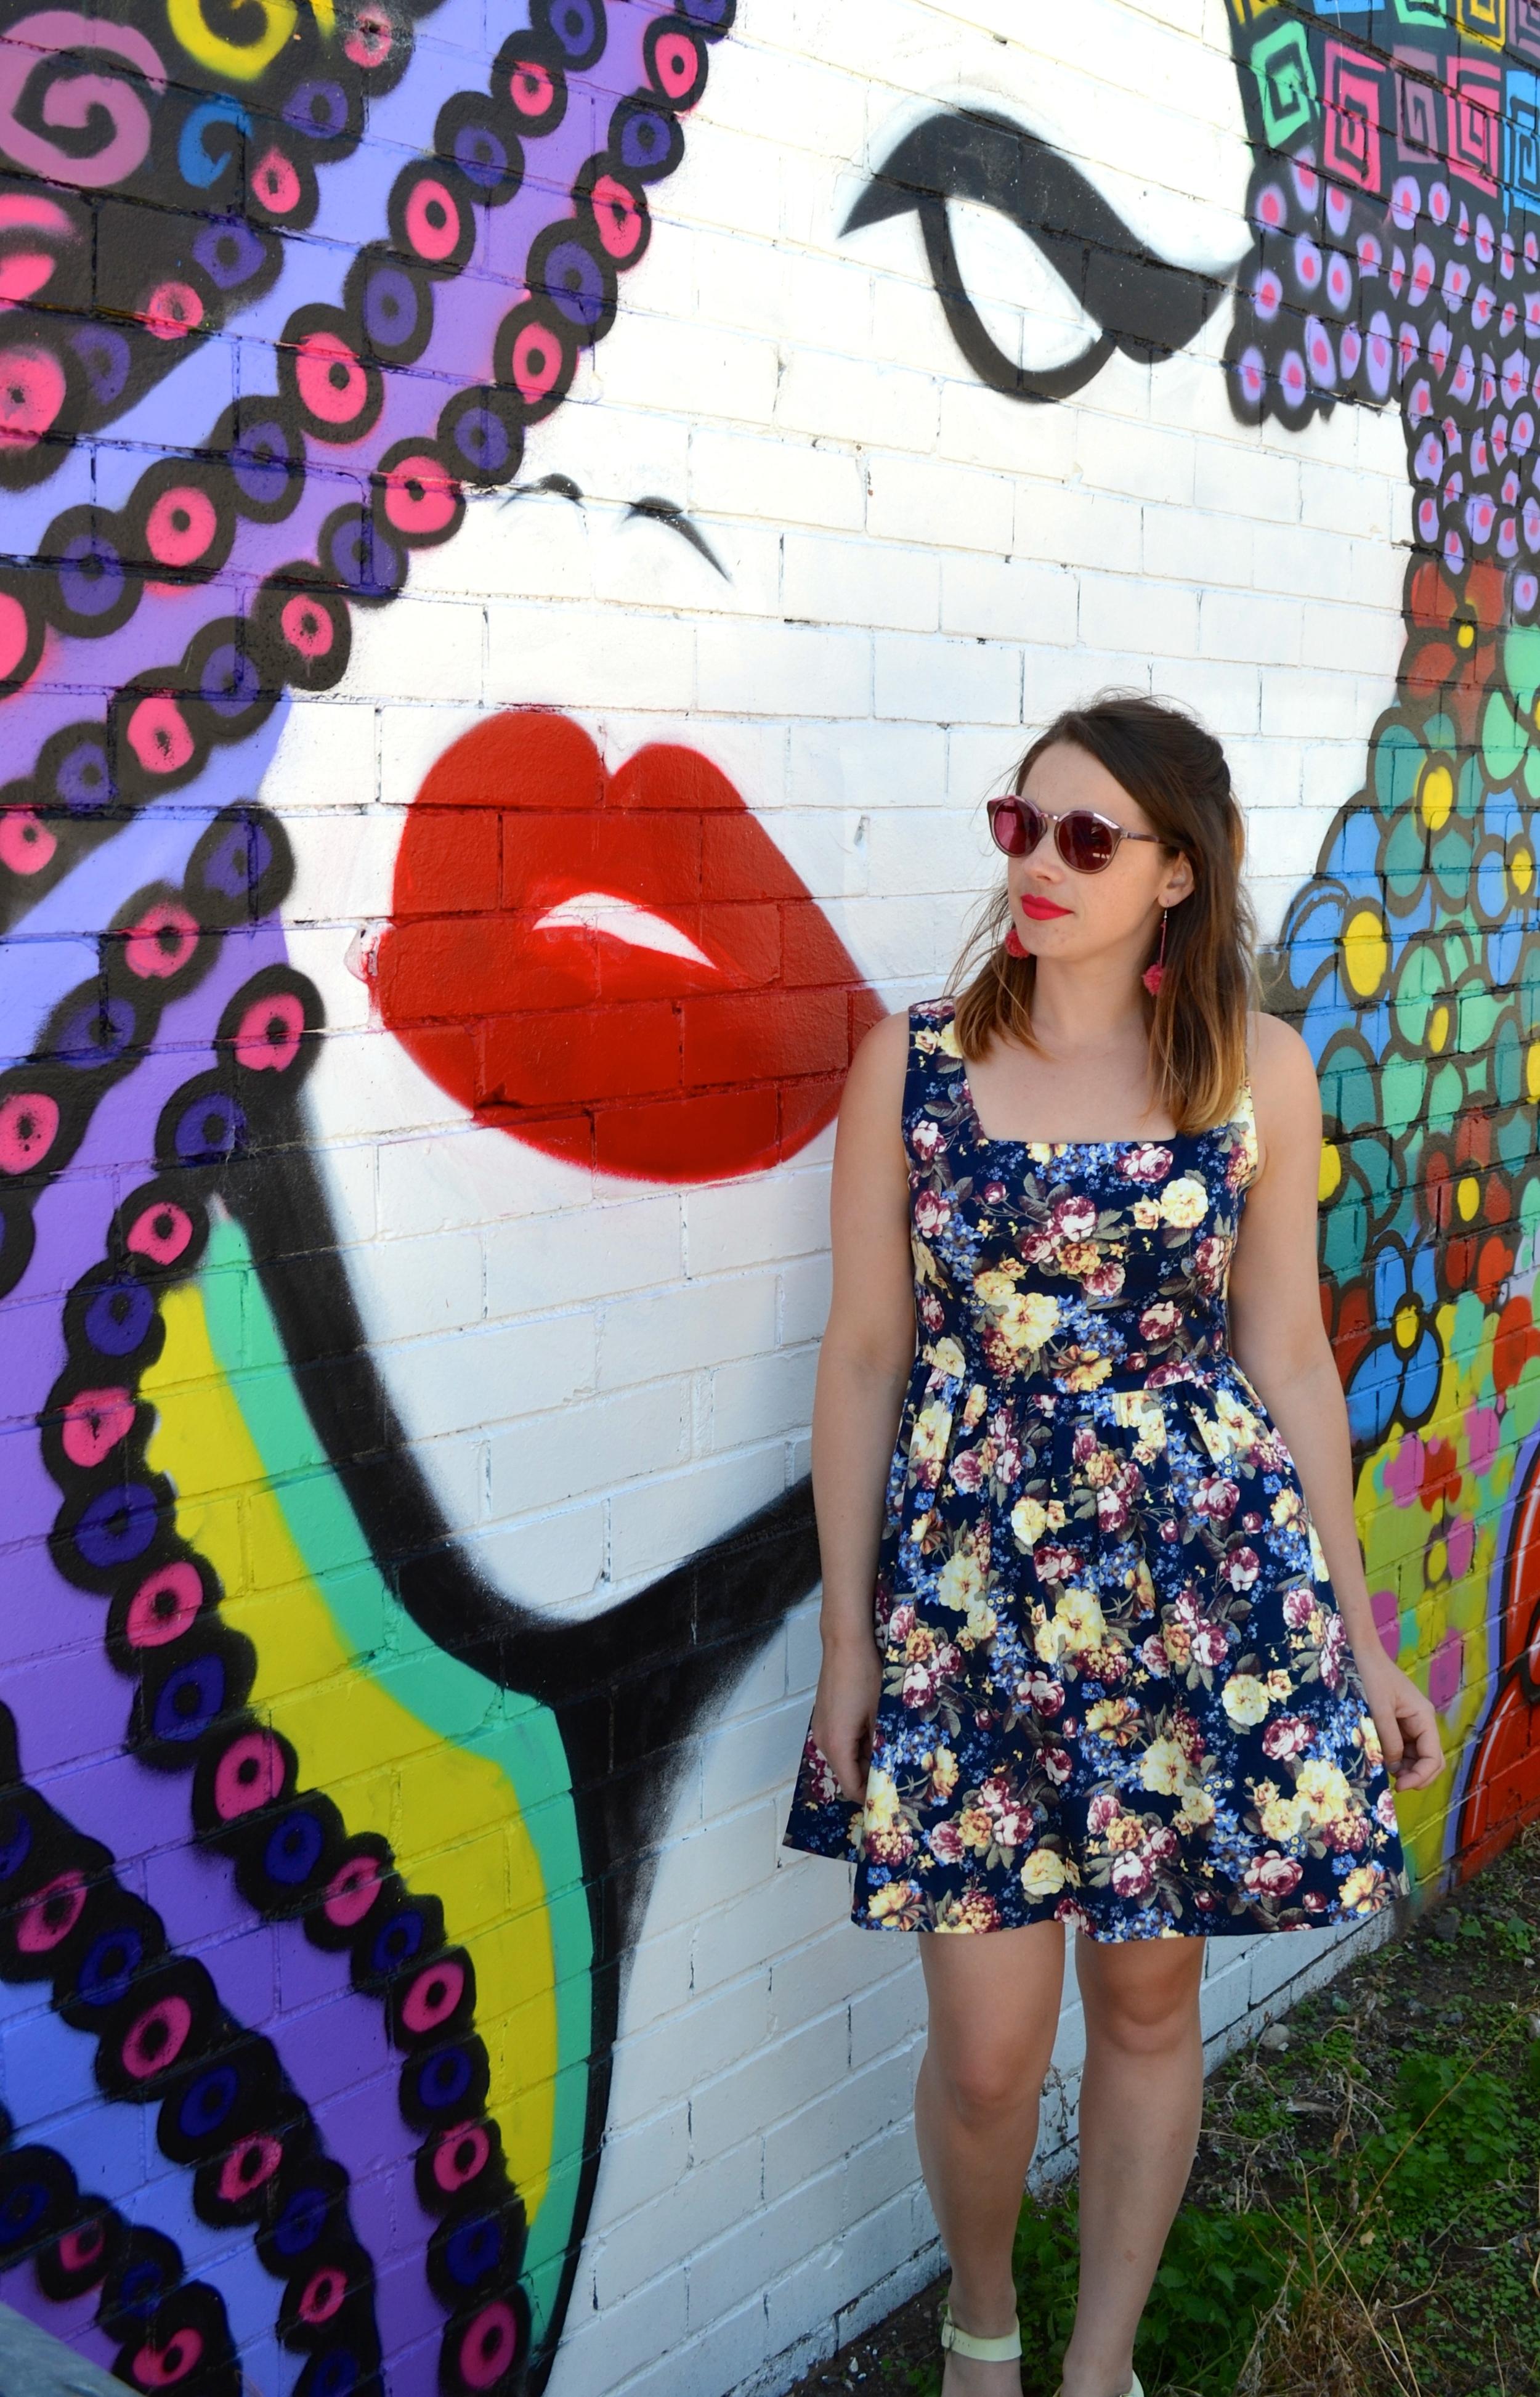 graffiti-woman-face-pom-pom-earrings-pink-sunglasses-bonlook